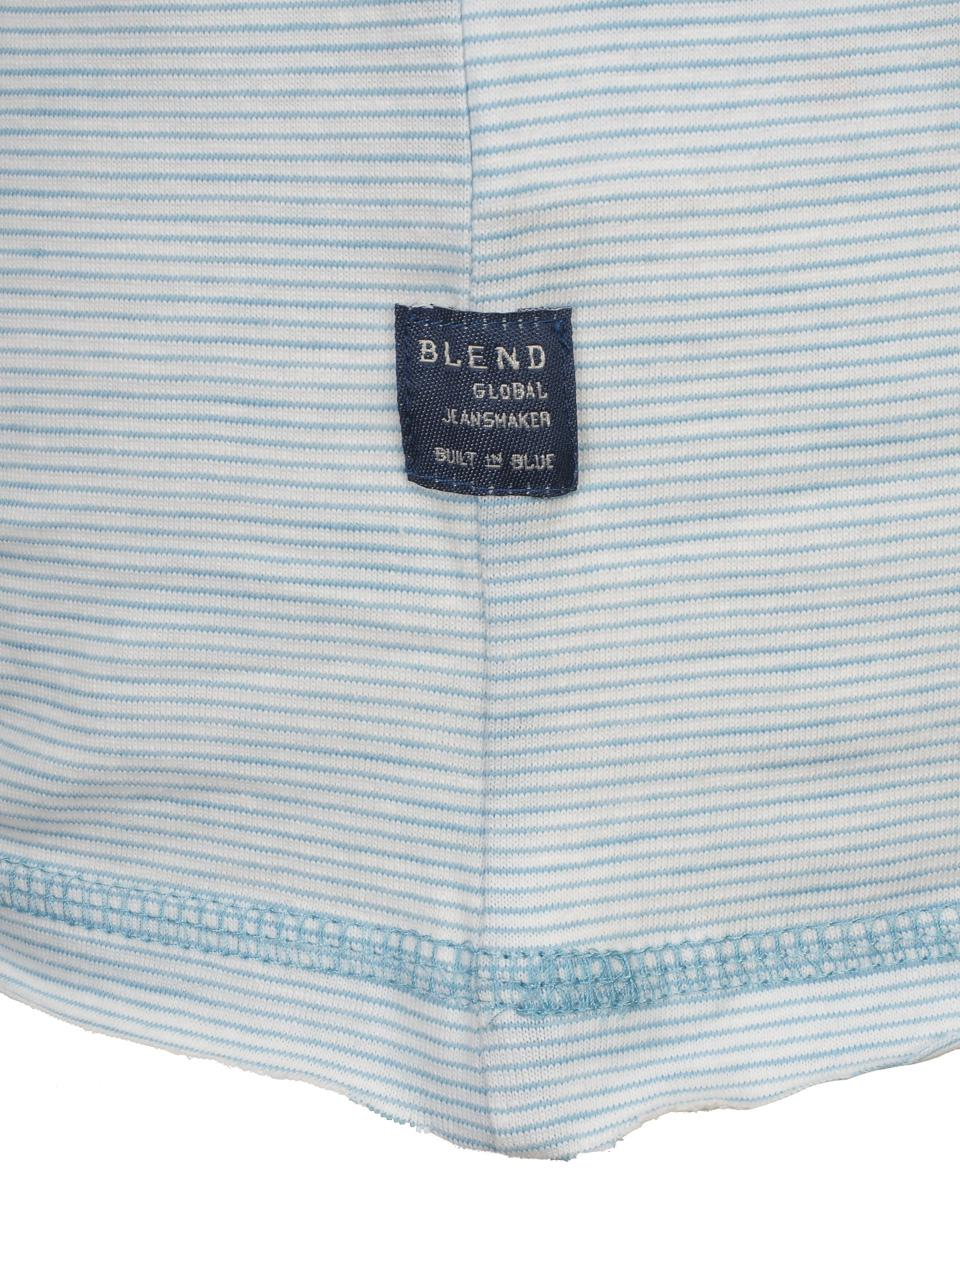 Short-Sleeve-T-Shirt-Blend-Prisco-Steel-Blue-Mc-Tee-Blue-52992-New thumbnail 4